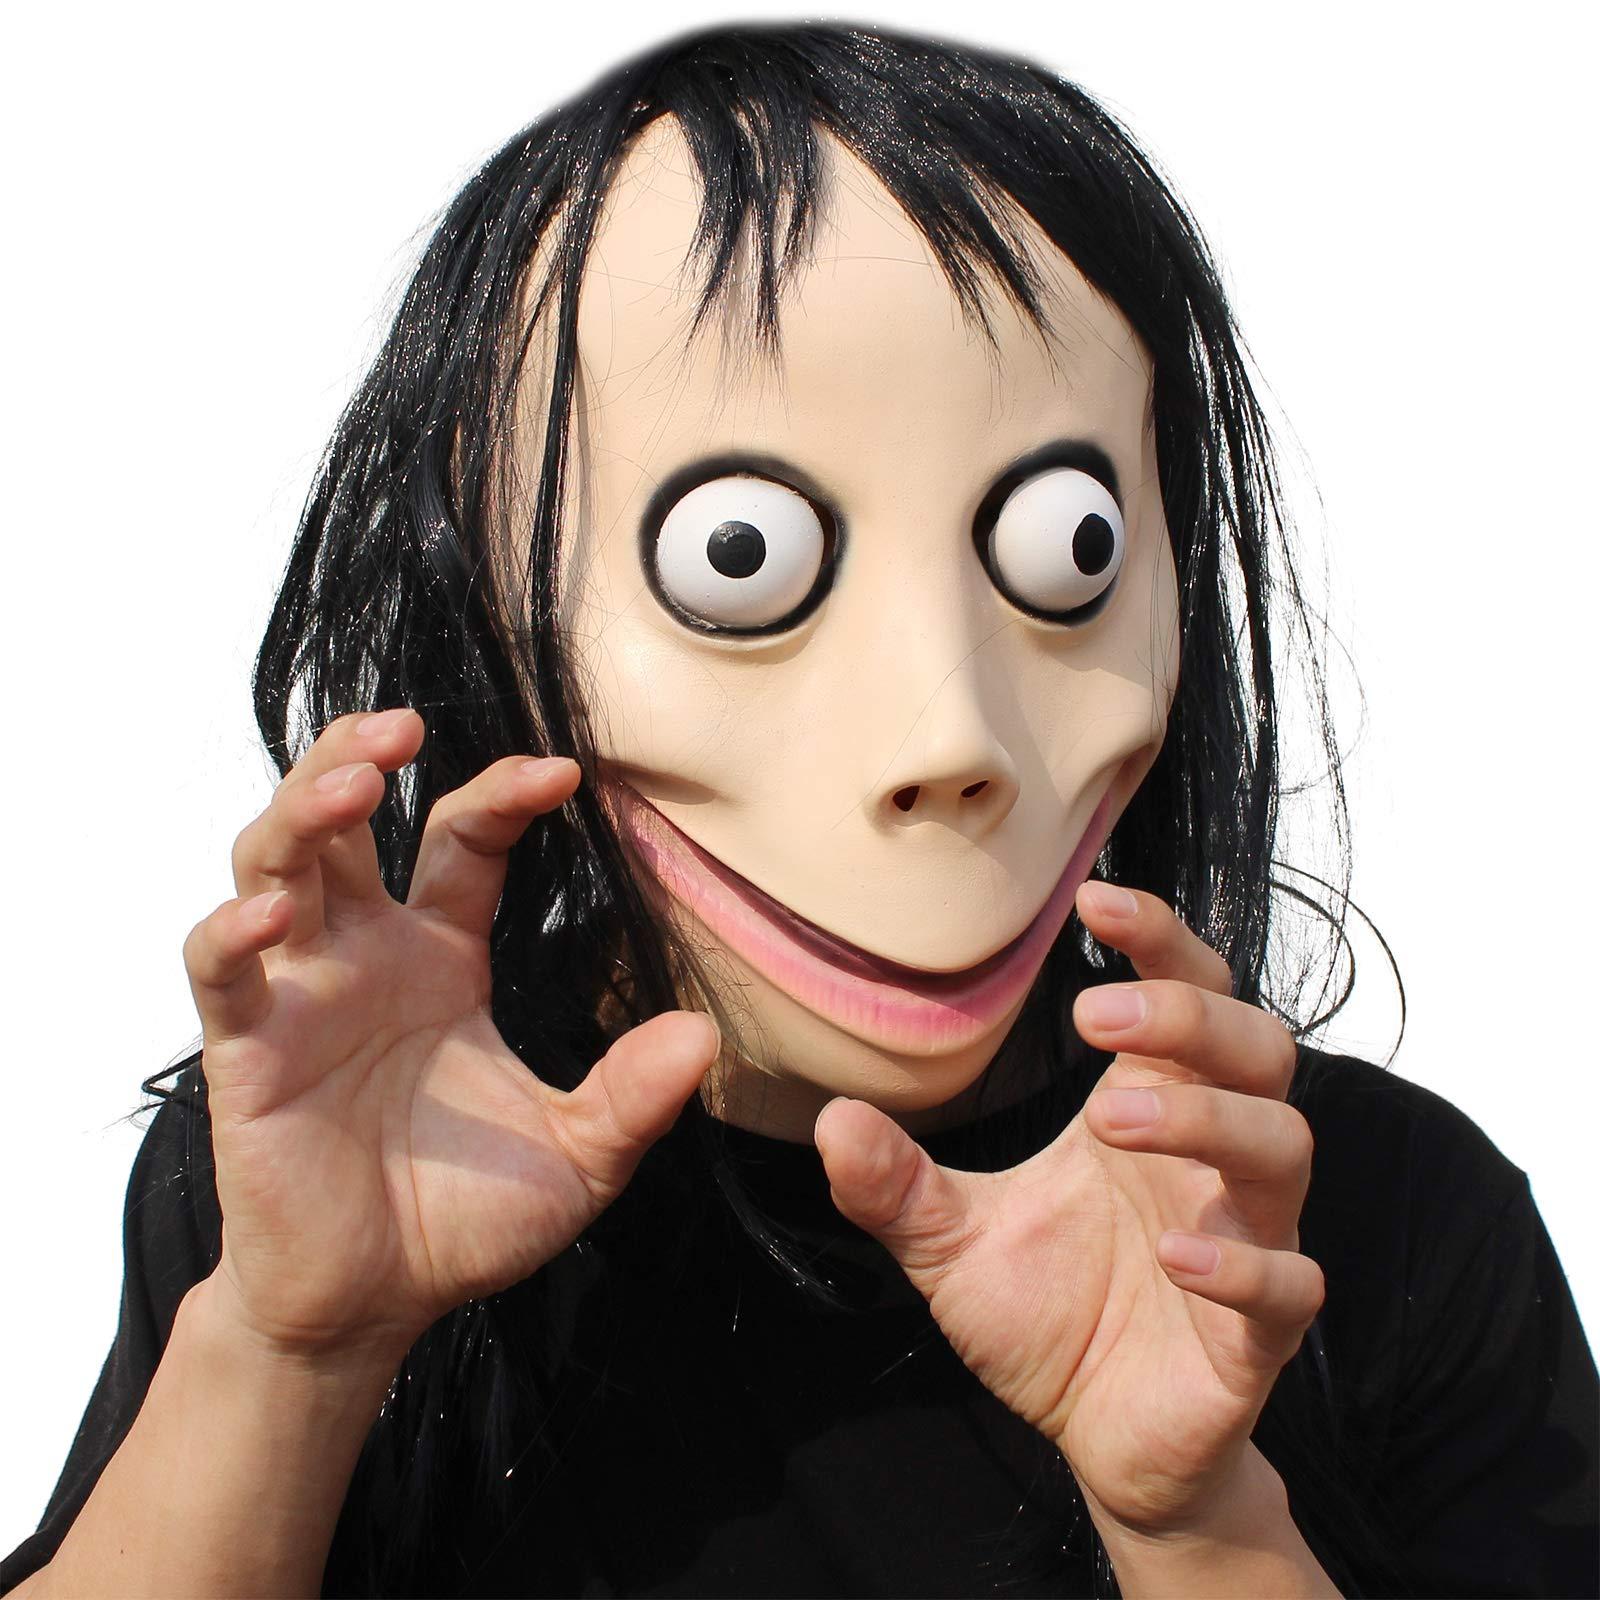 PartyHop - Momo Scary Mask Brown by PartyHop